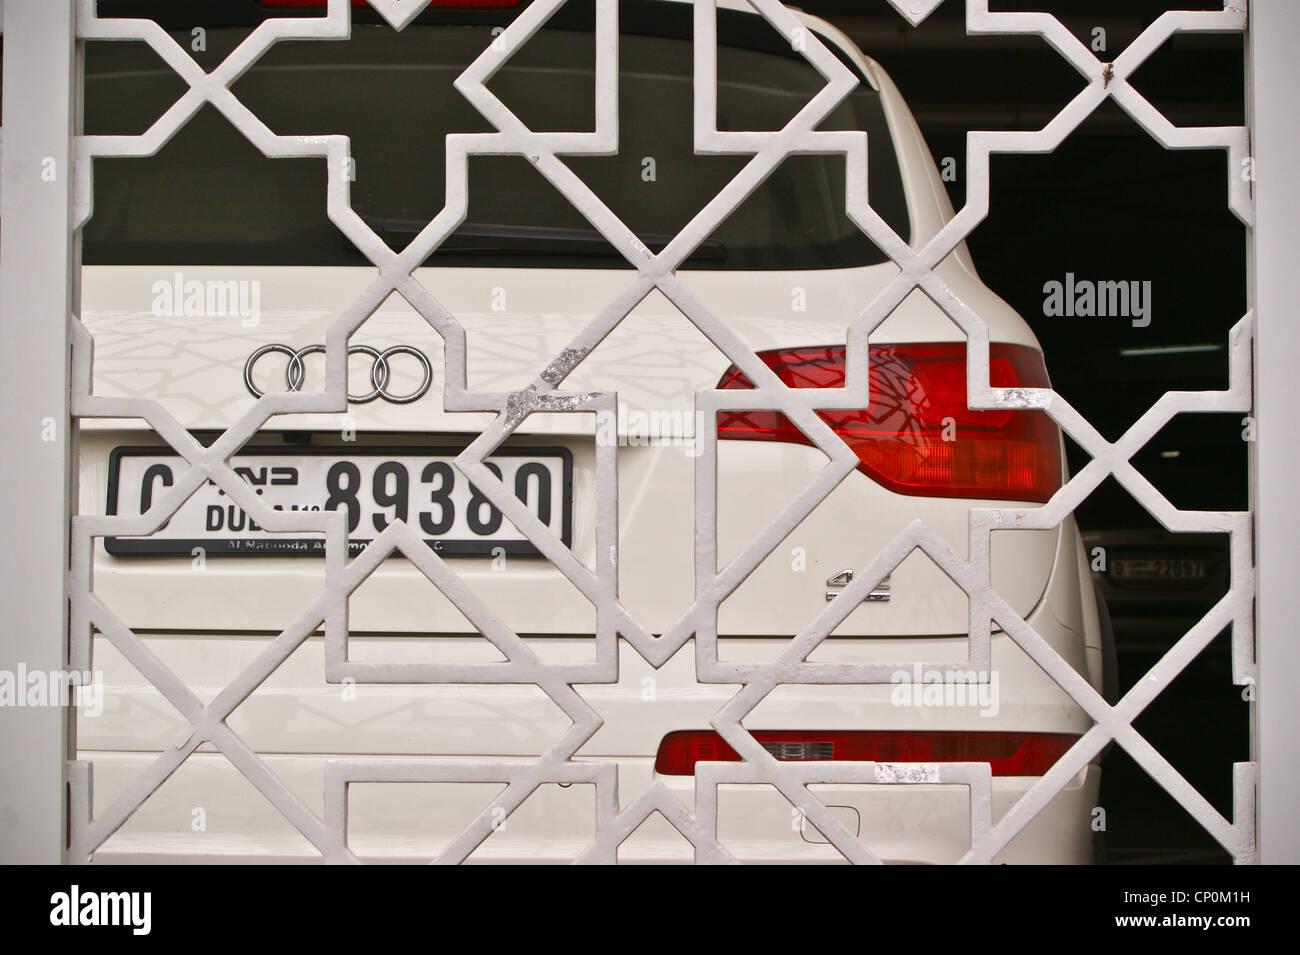 An Audi Quattro With Dubai Number Plate United Arab